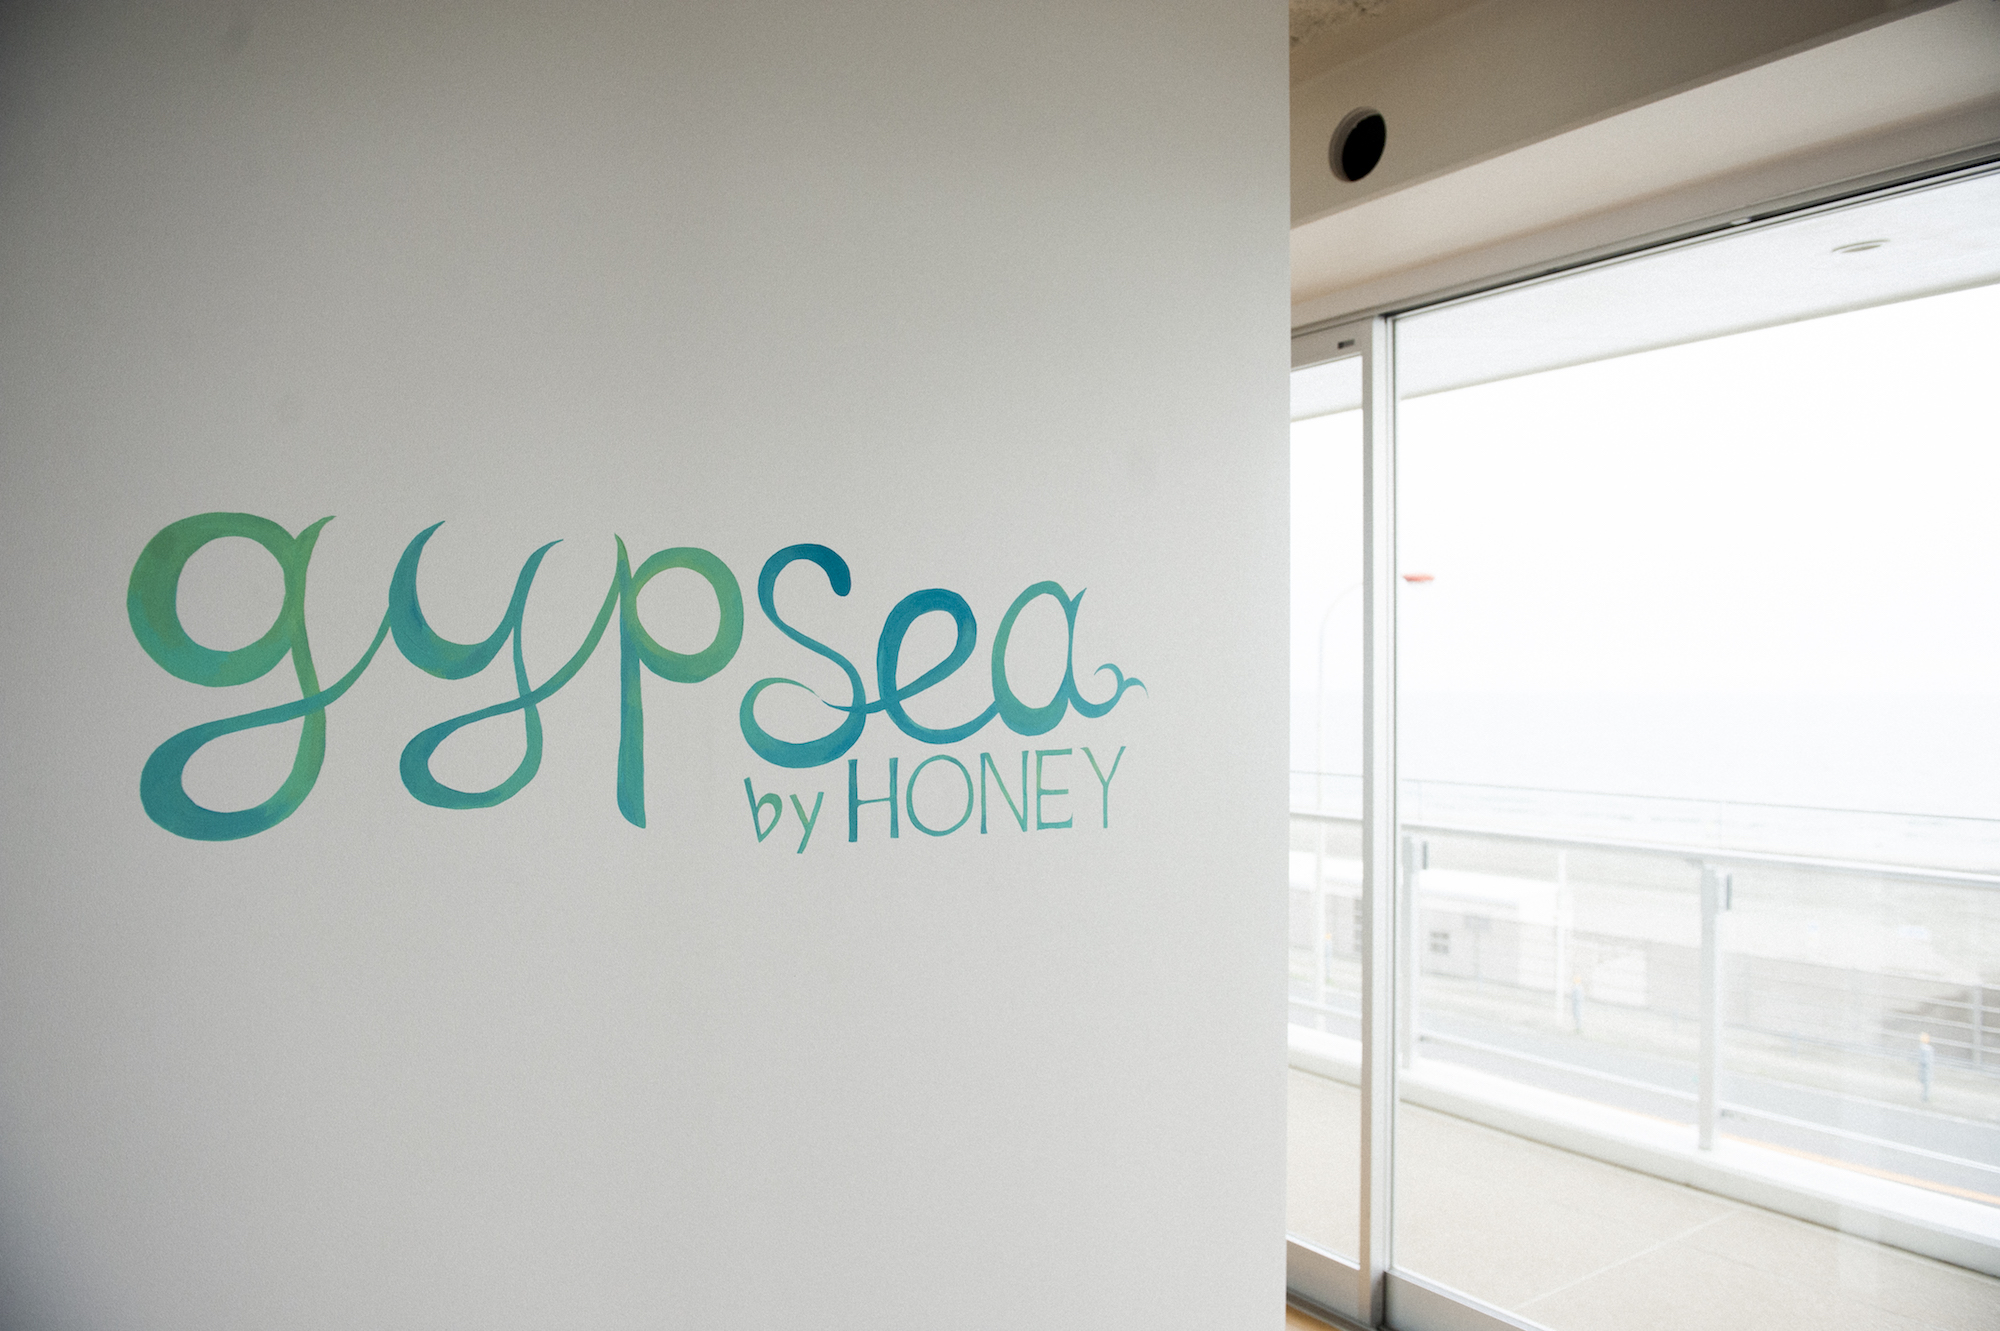 GYPSEA by HONEY